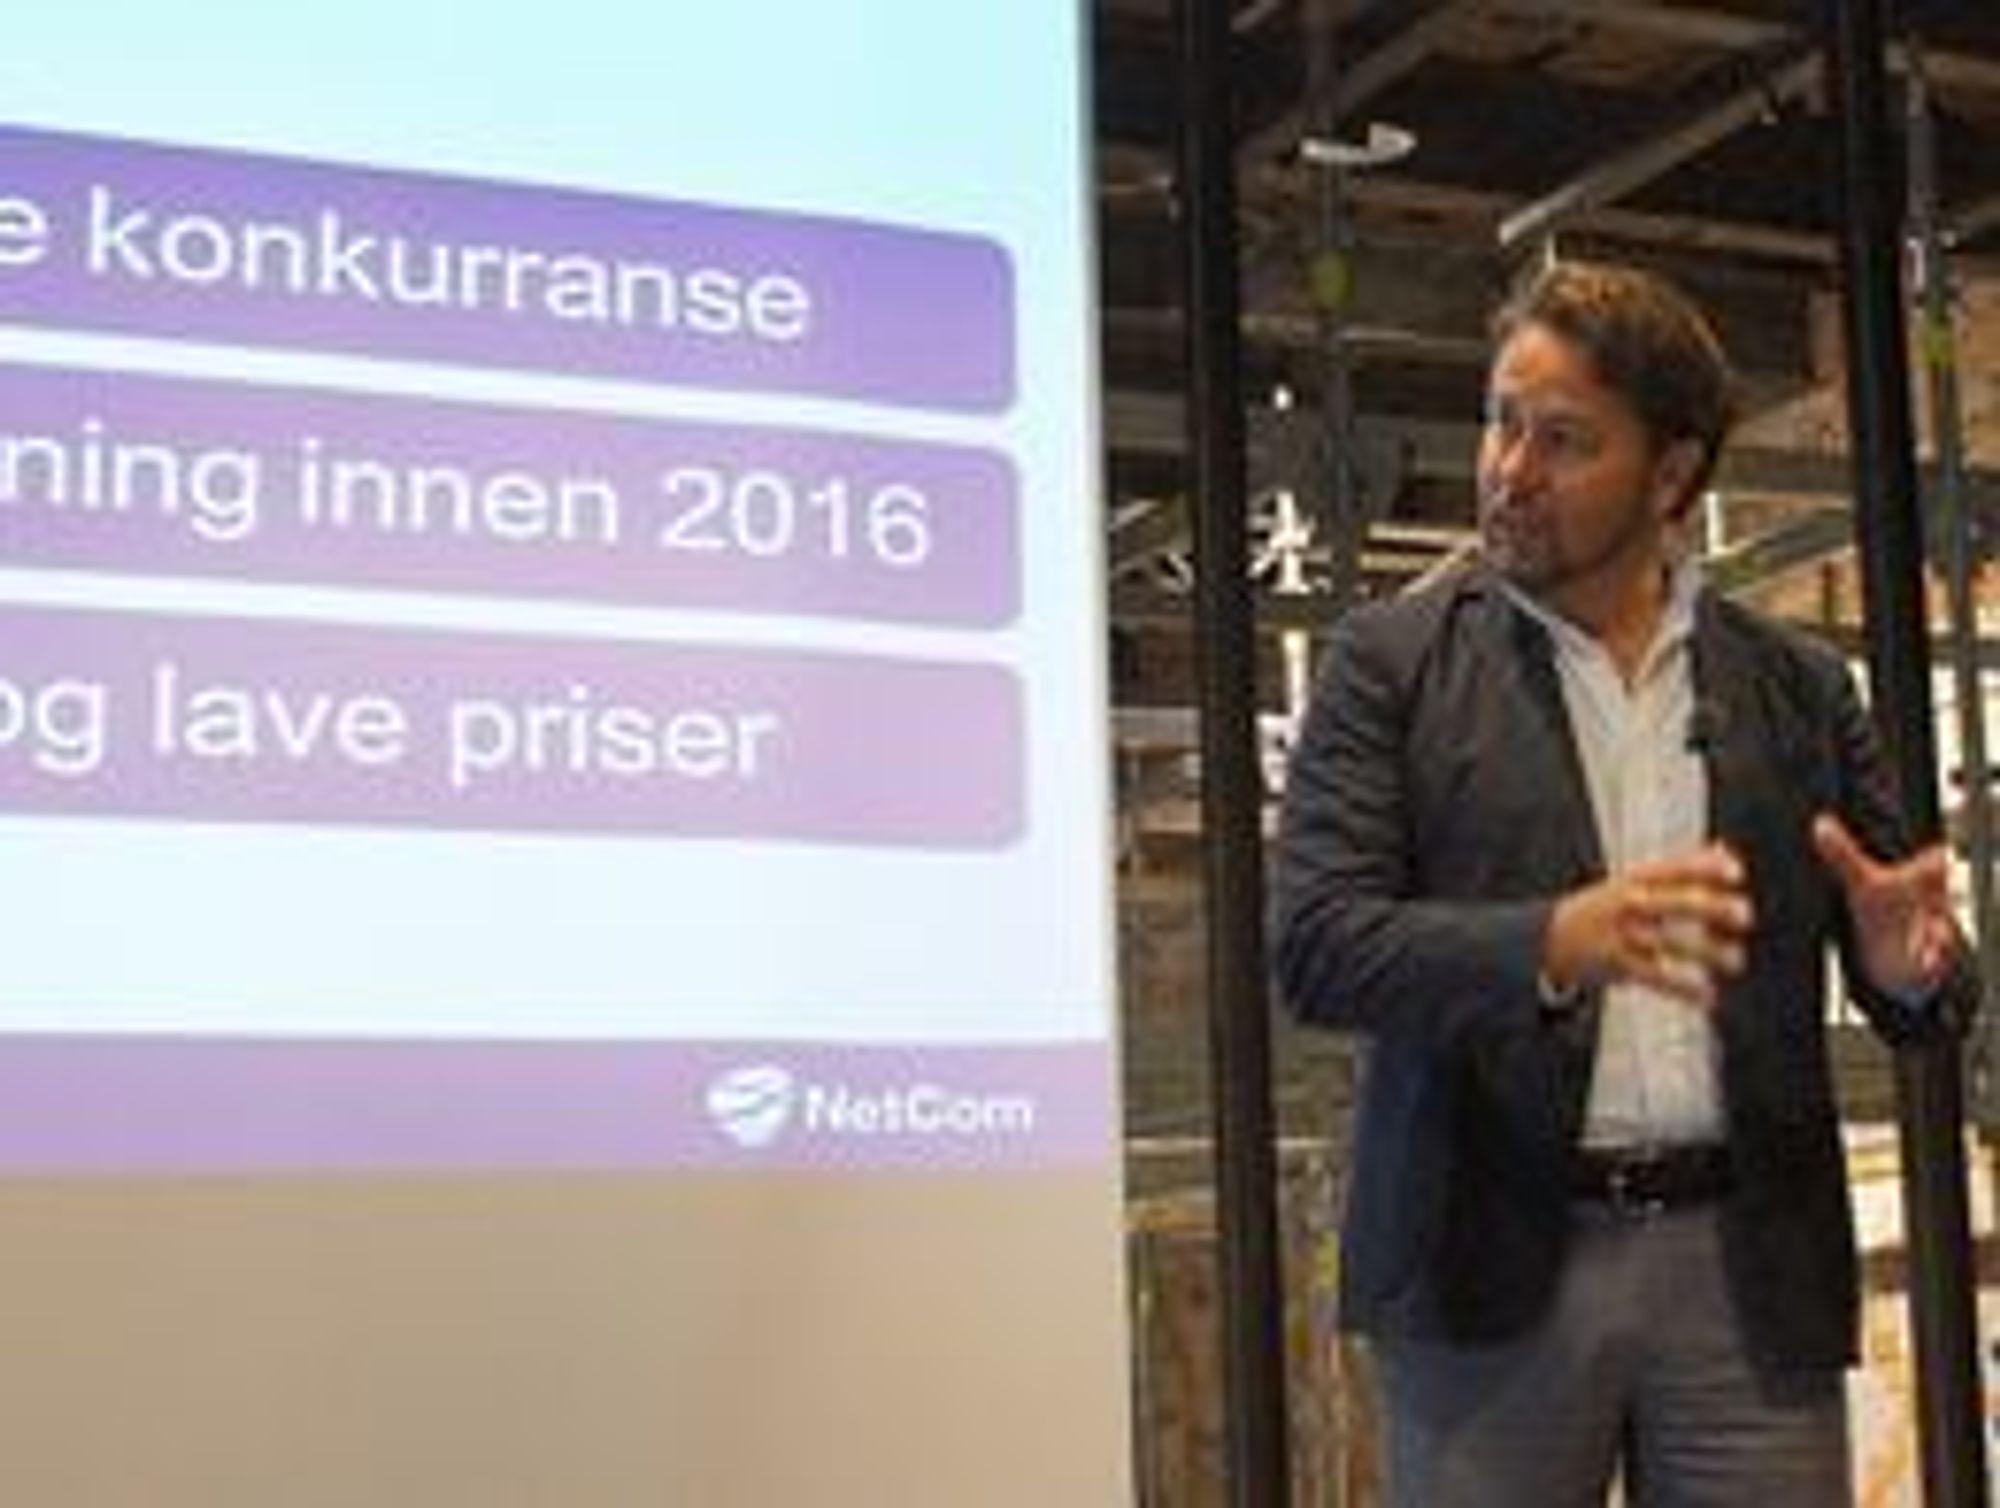 Tele2-sjef Arild Hustad